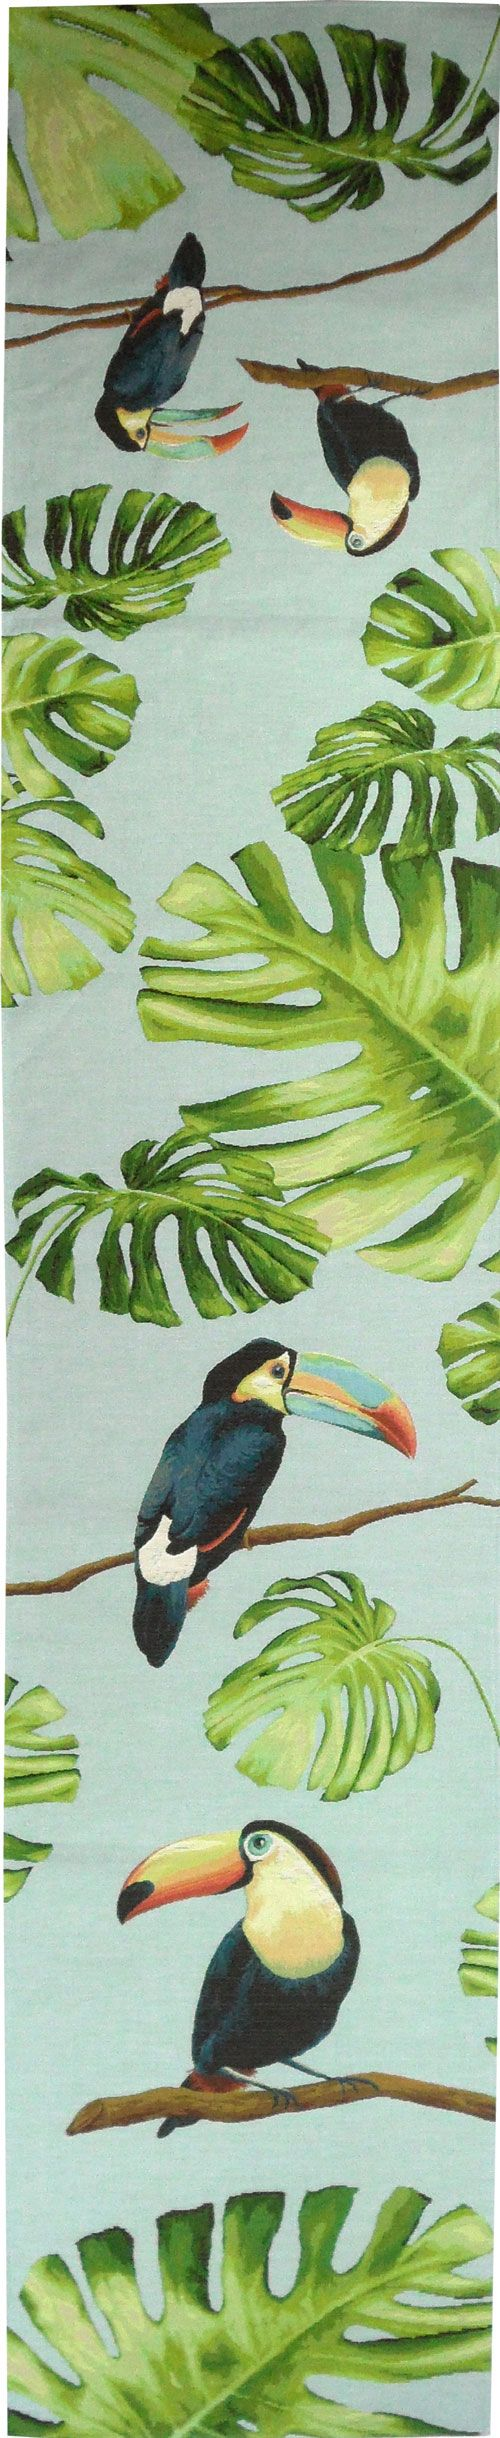 chemin de lit jacquard 50x240 cm toucan bleu toucan hornbill pinterest love this love. Black Bedroom Furniture Sets. Home Design Ideas